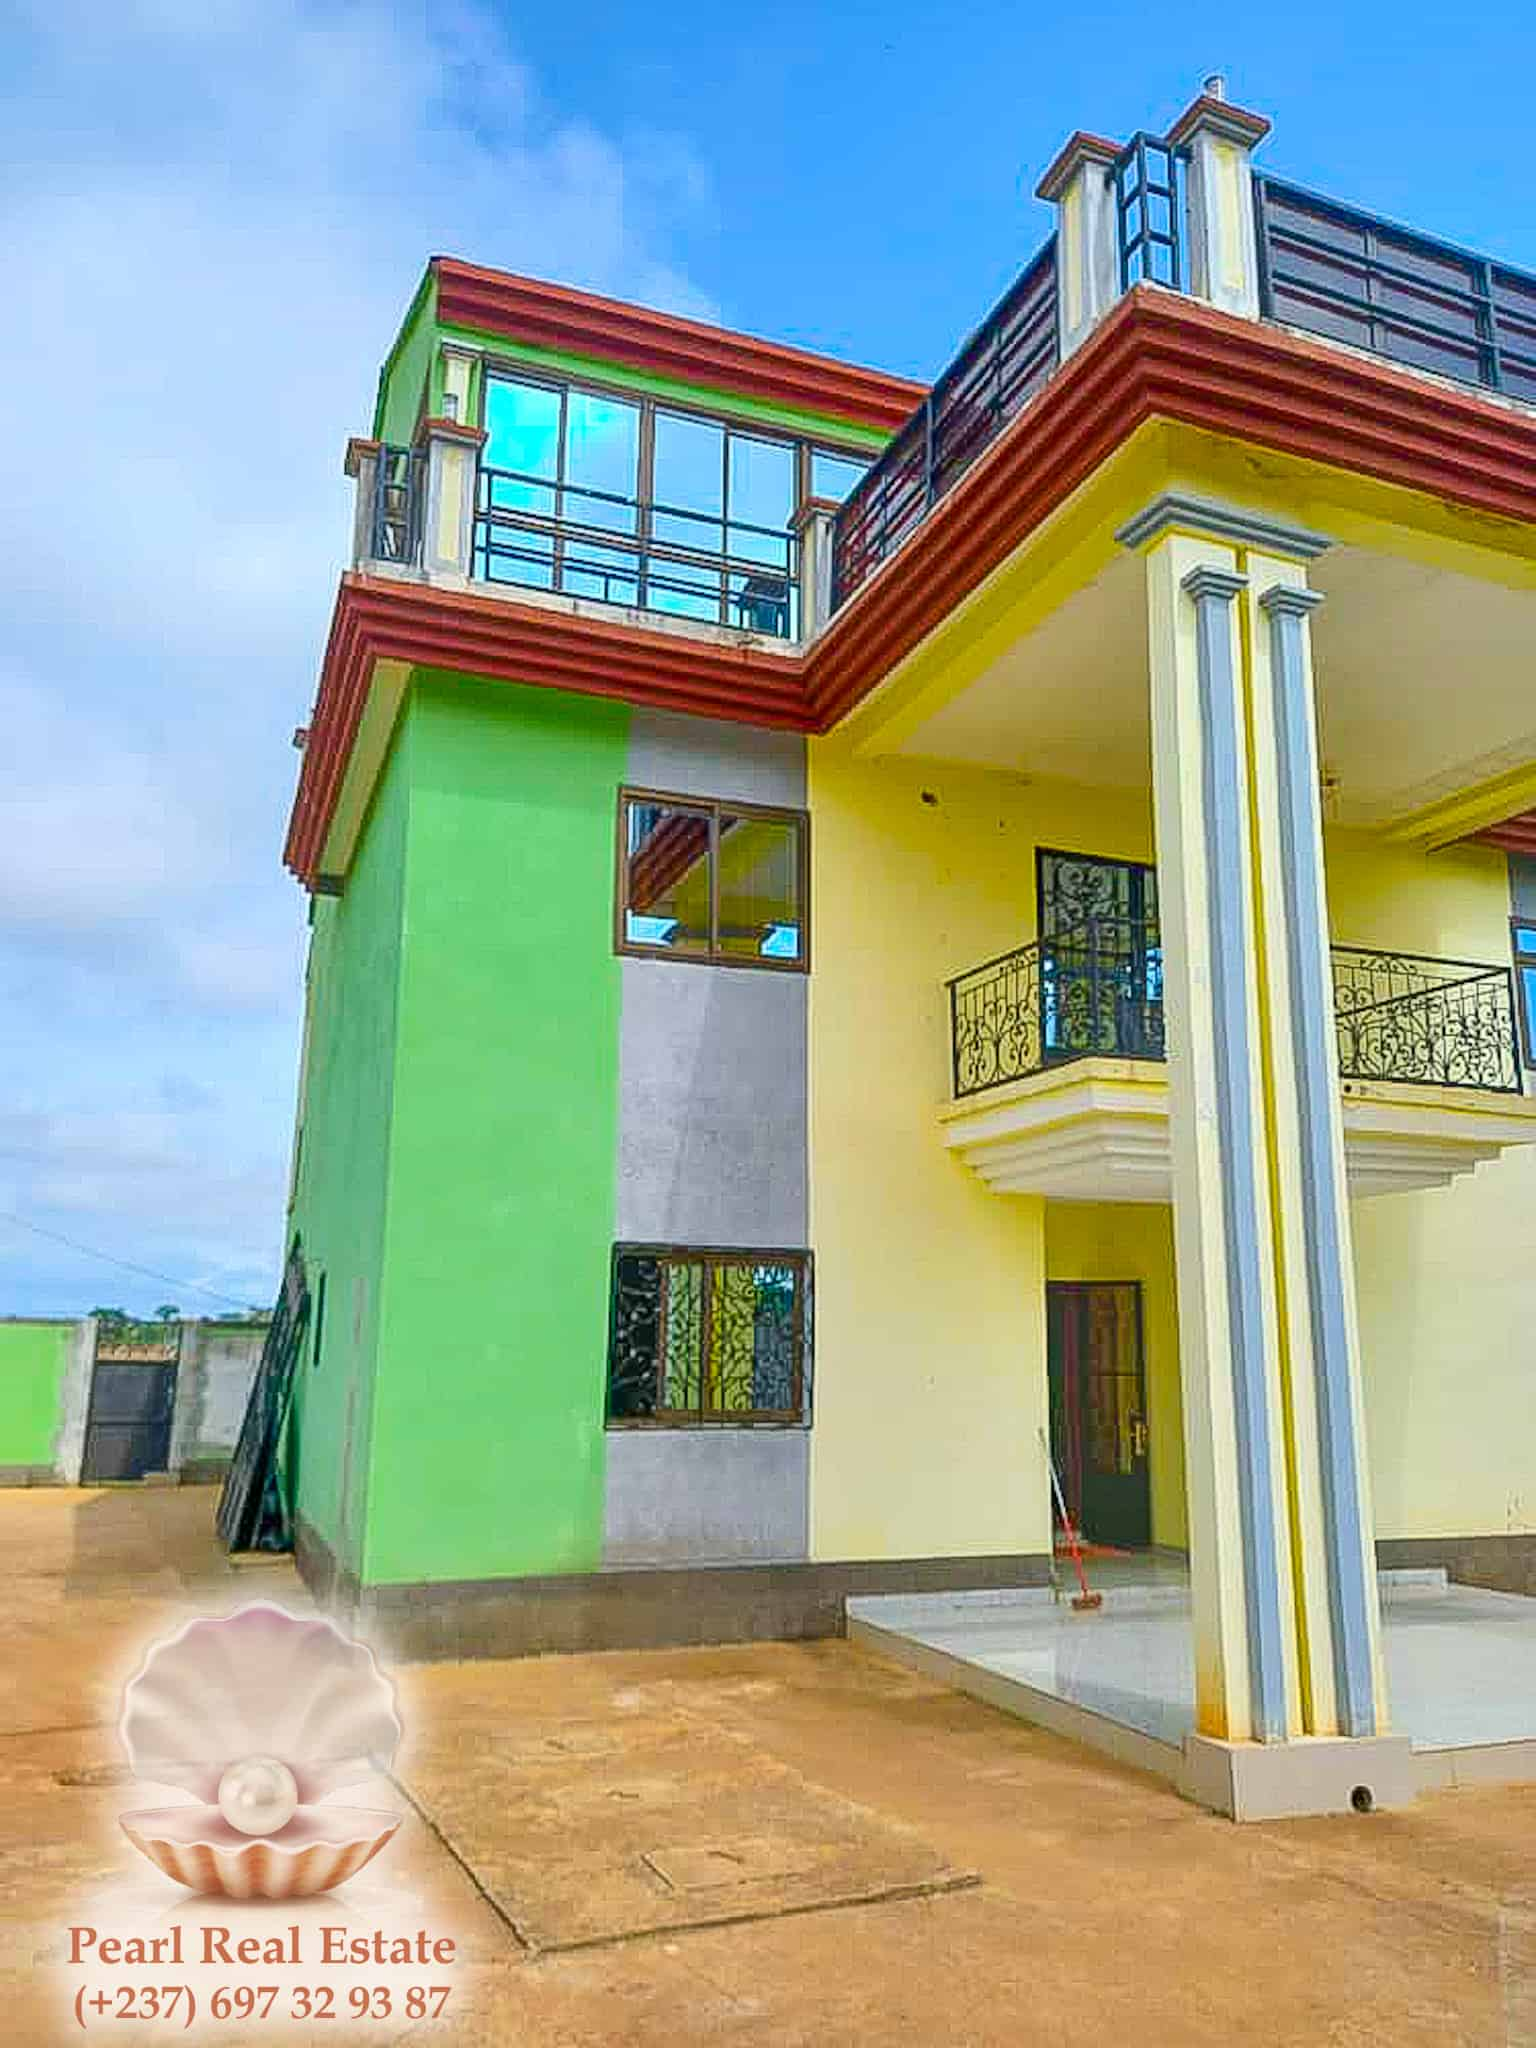 House (Villa) for sale - Yaoundé, Odza, Borne 10 - 1 living room(s), 4 bedroom(s), 3 bathroom(s) - 130 000 000 FCFA / month